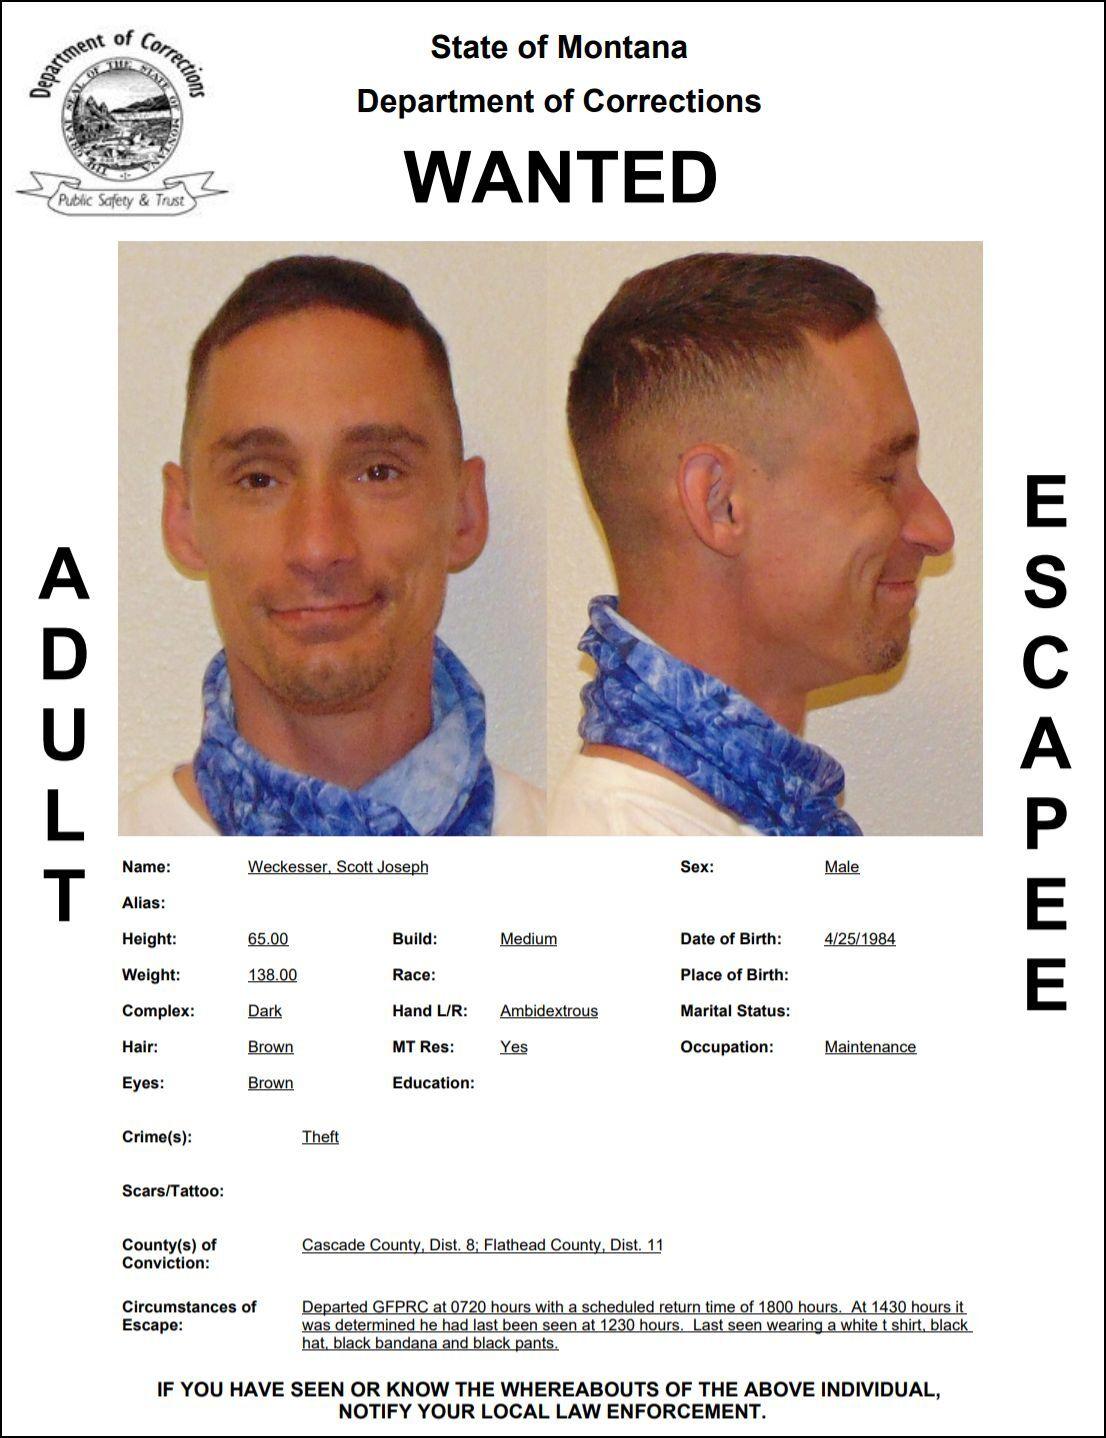 Weckesser reported as escapee/walkaway